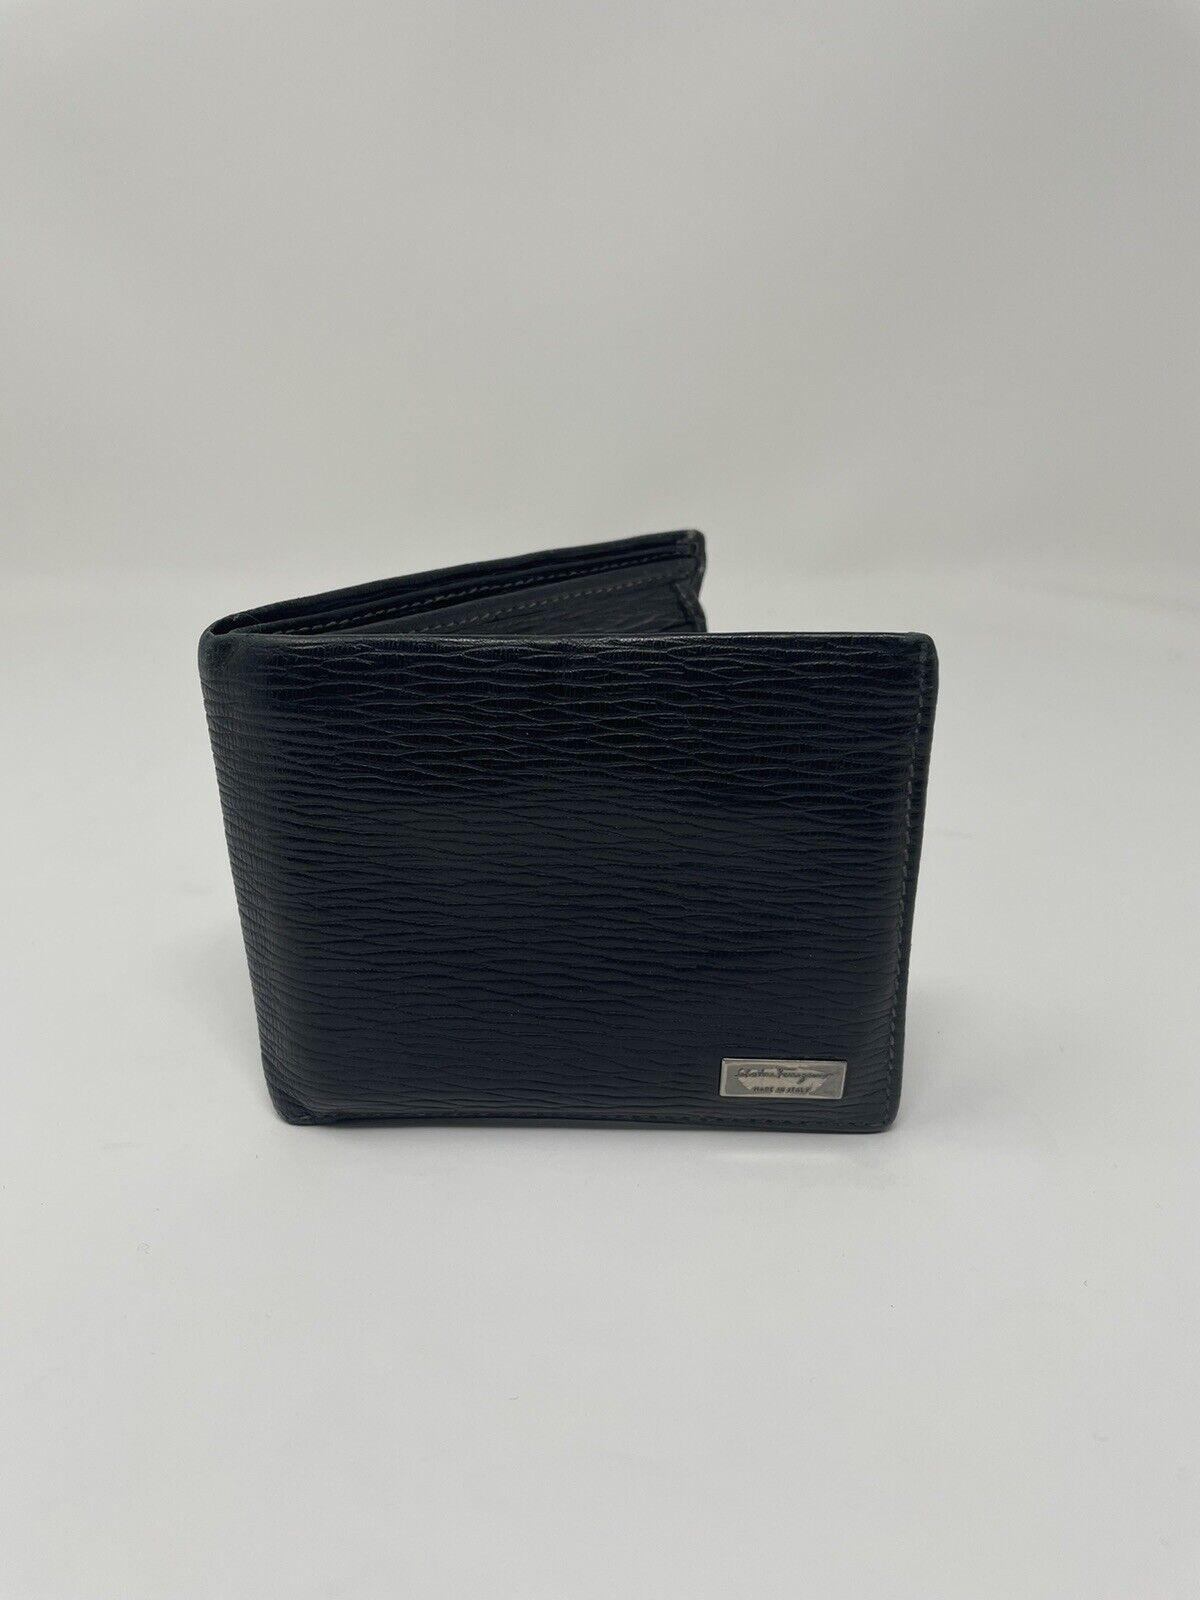 SALVATORE FERRAGAMO Men's Black Leather Wallet - Used